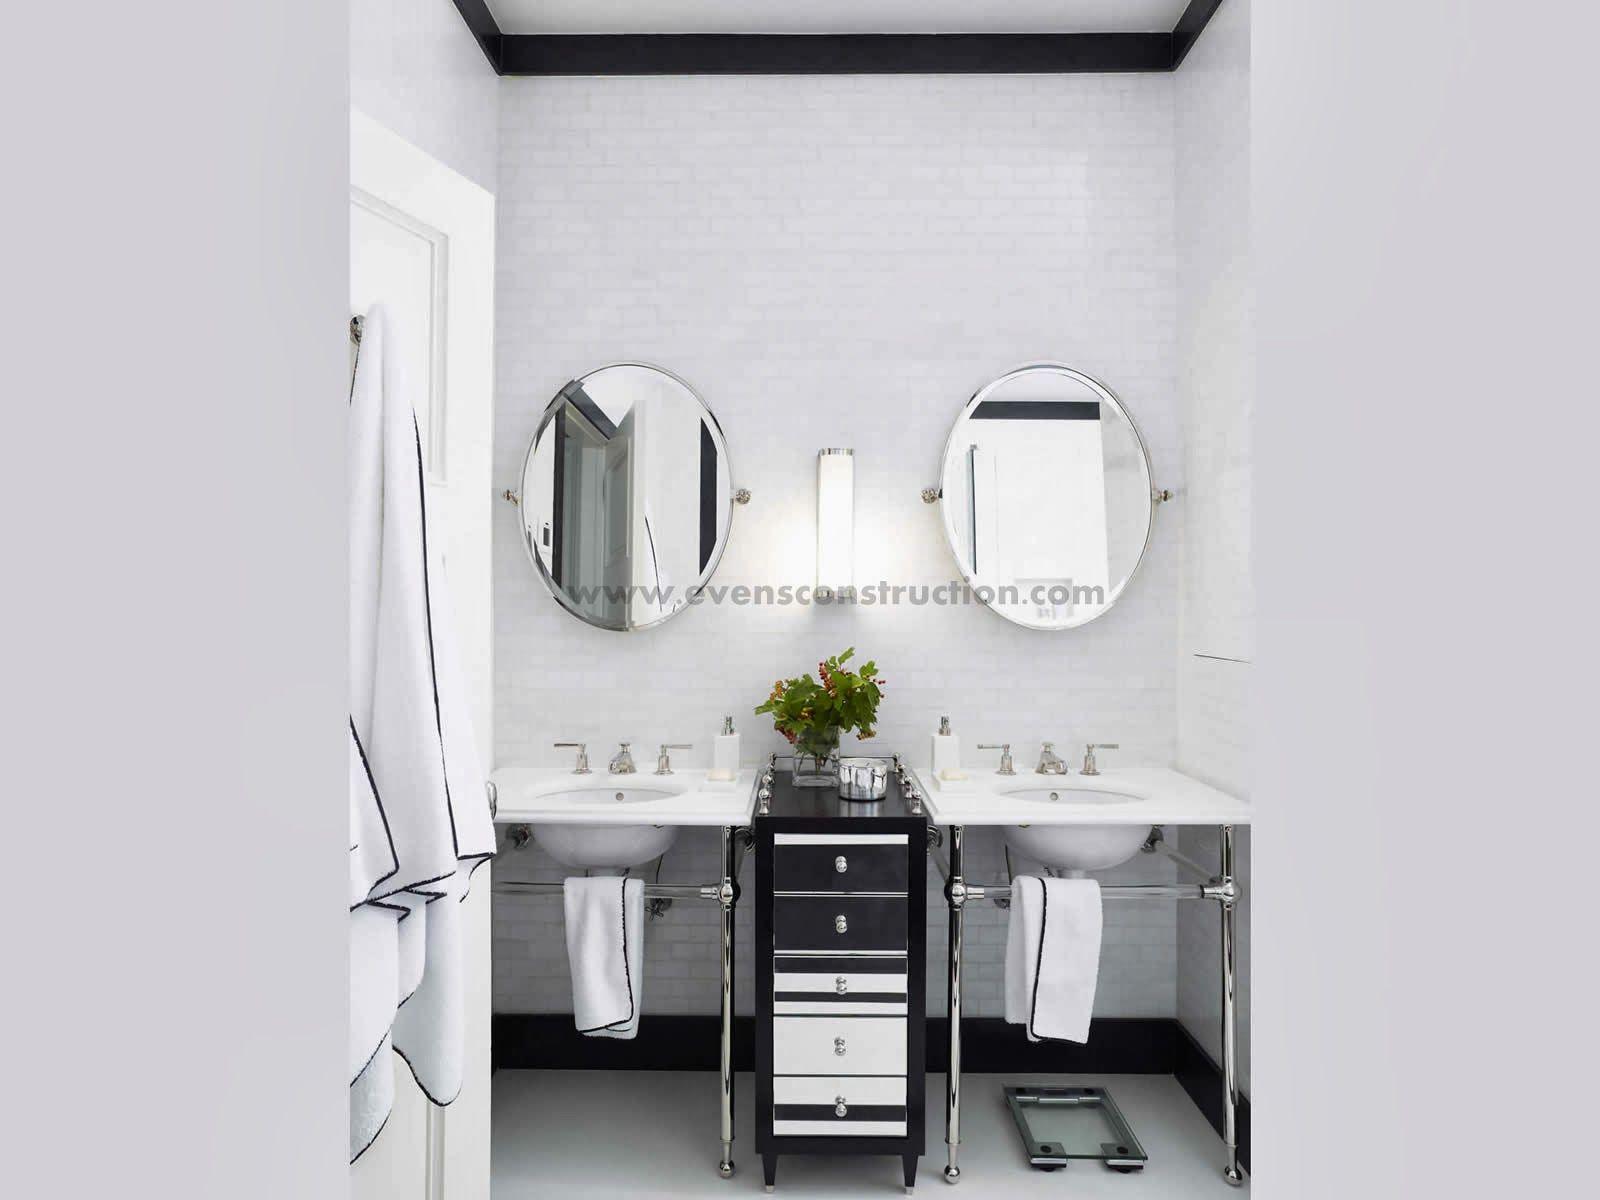 Traditional Bathroom Sinks Bowl Sinks Fabulous Design Long Retro Pedestal Sink Vanity With